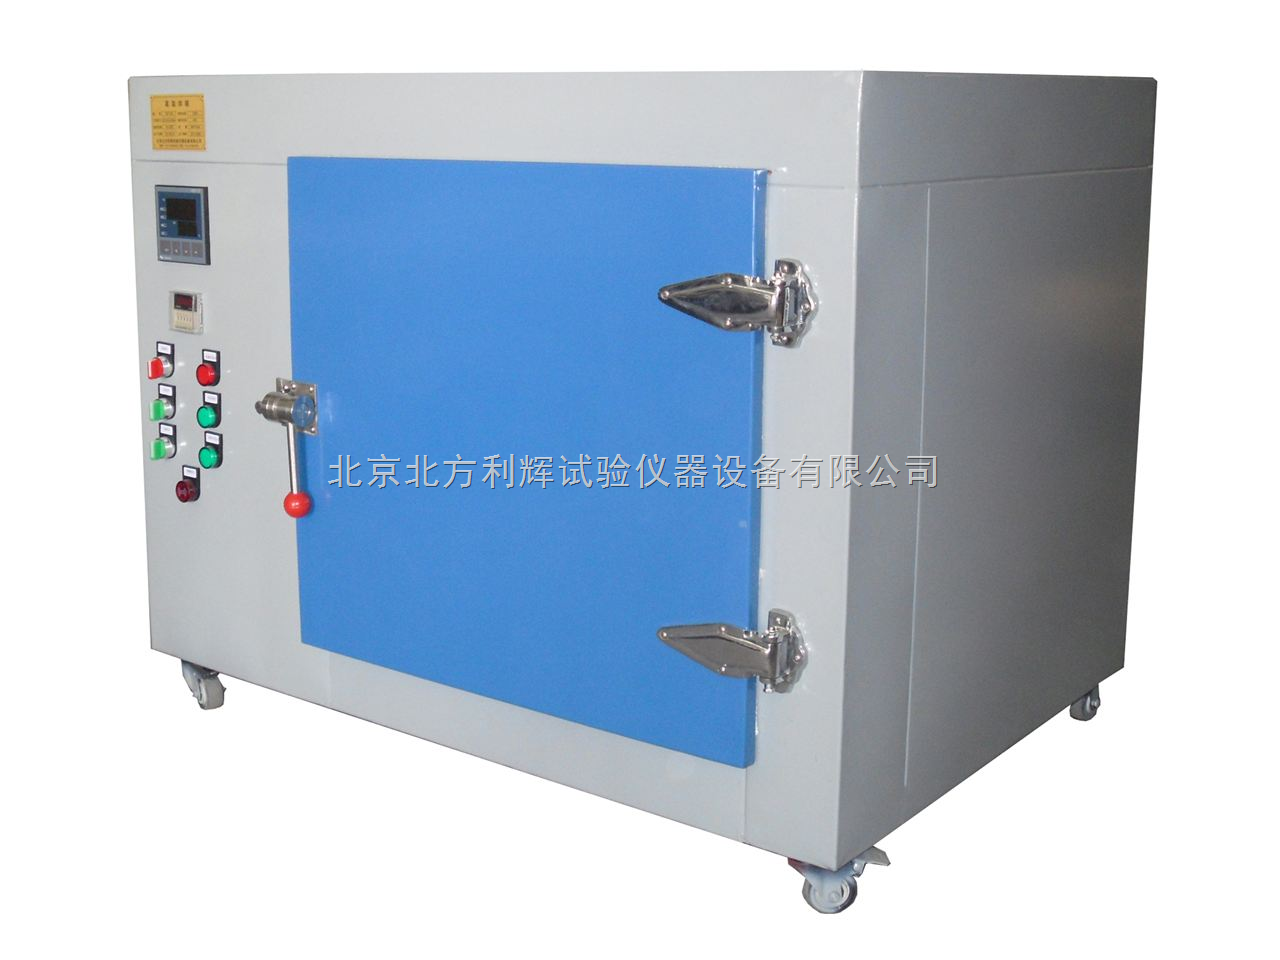 GWH-506 500度高温试验箱+北京